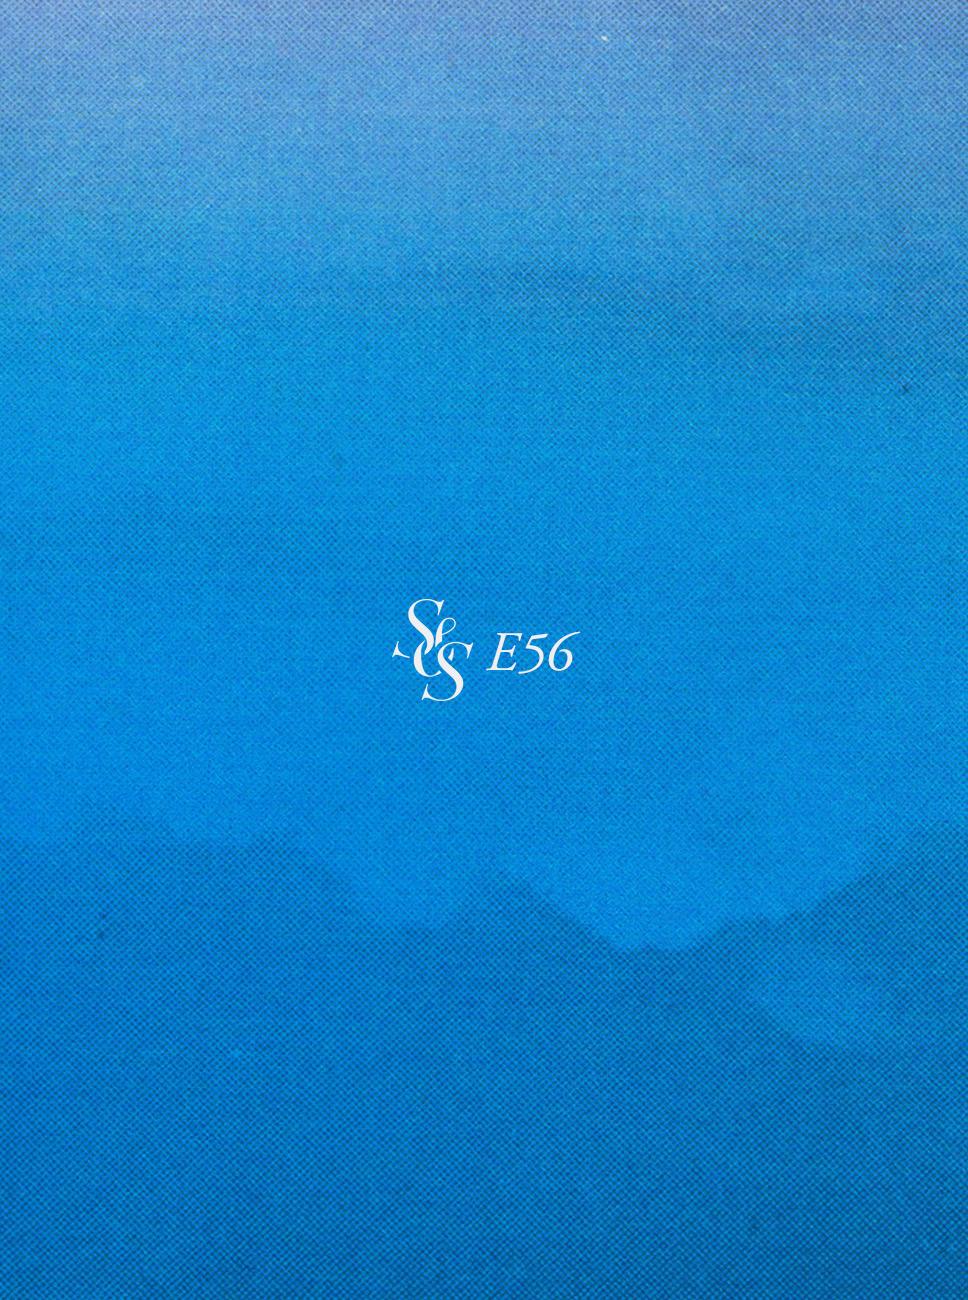 S&S-NewtownRadio-E56